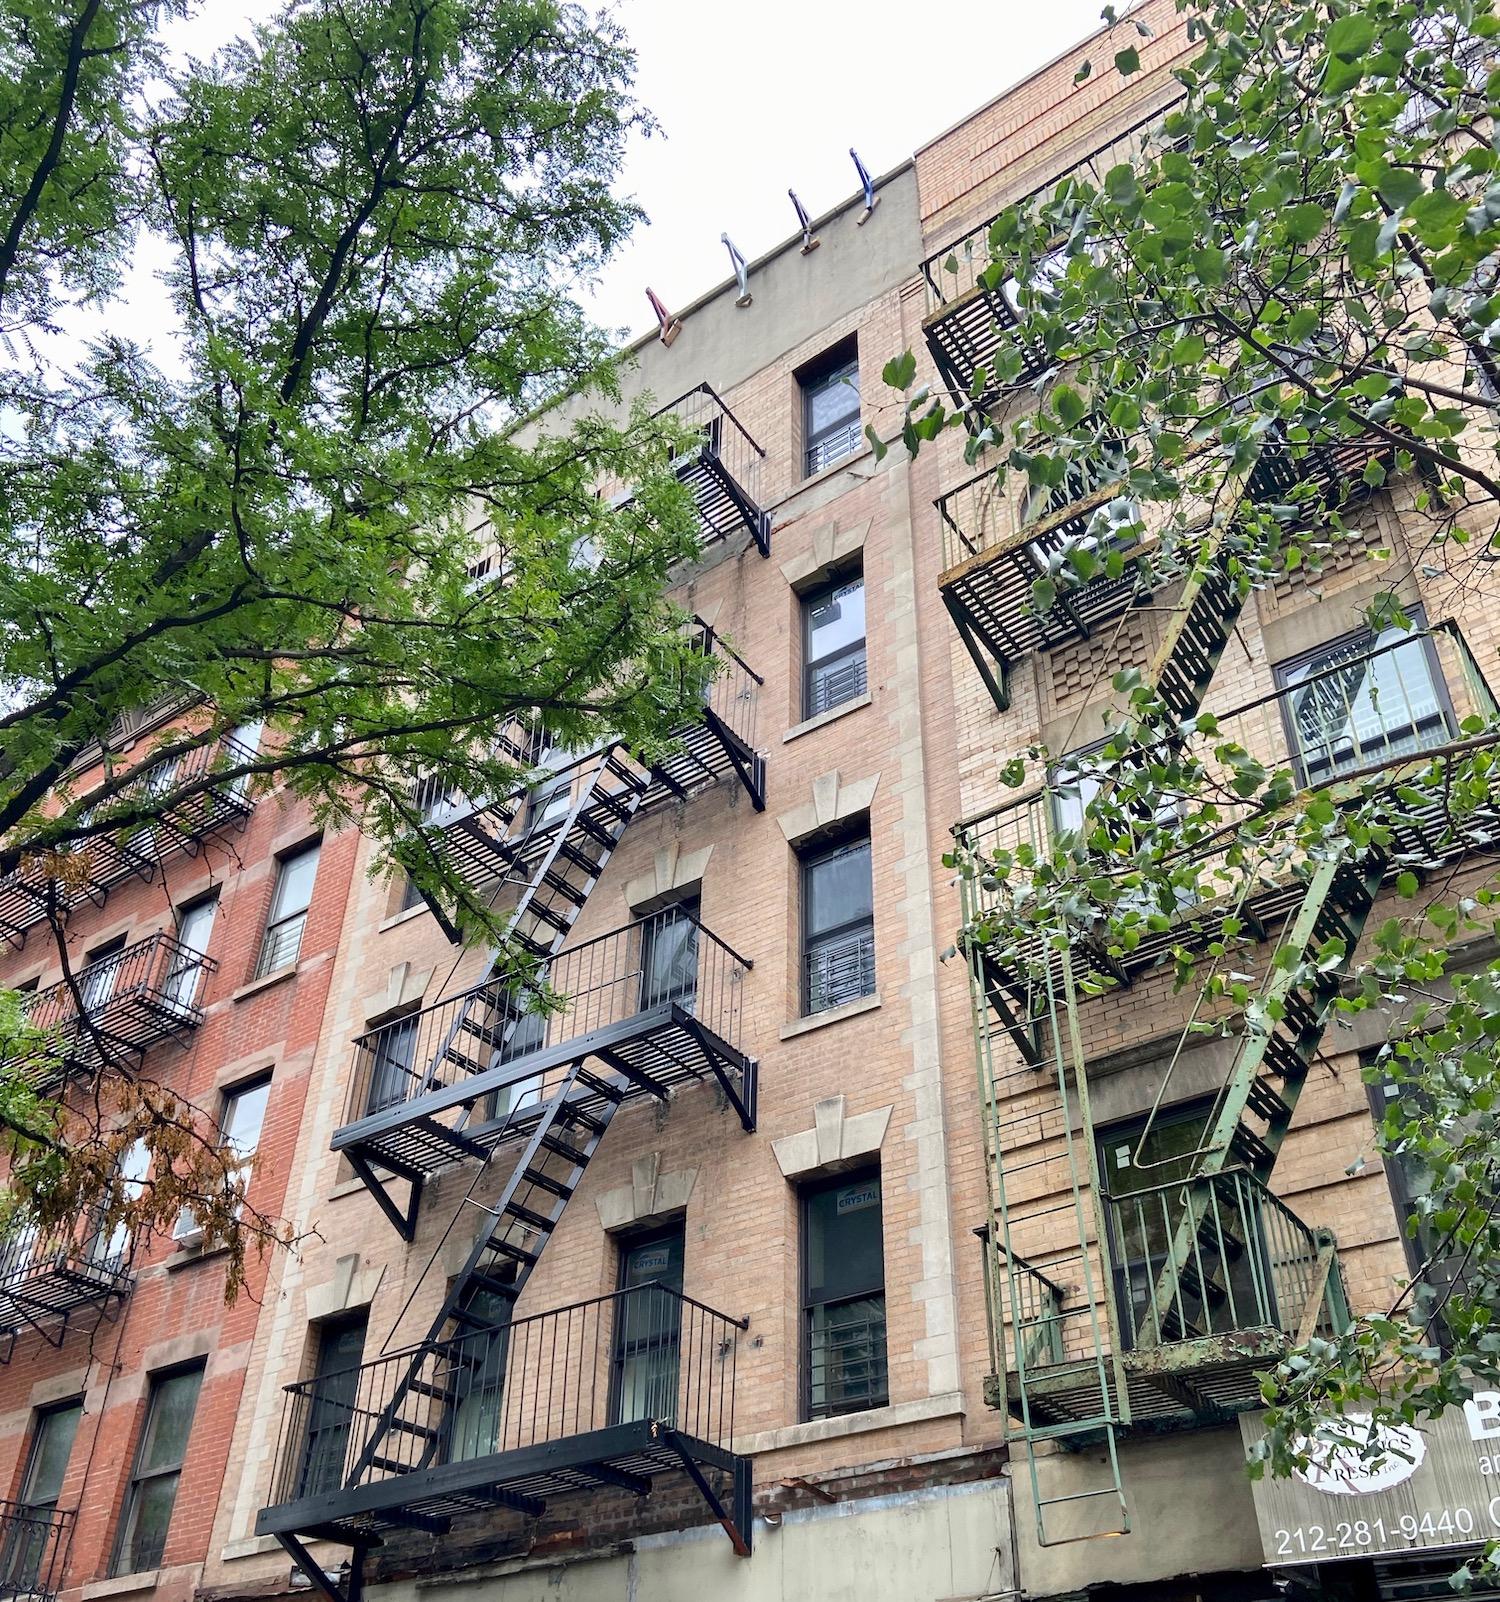 1646 Amsterdam Avenue in Harlem, Manhattan.